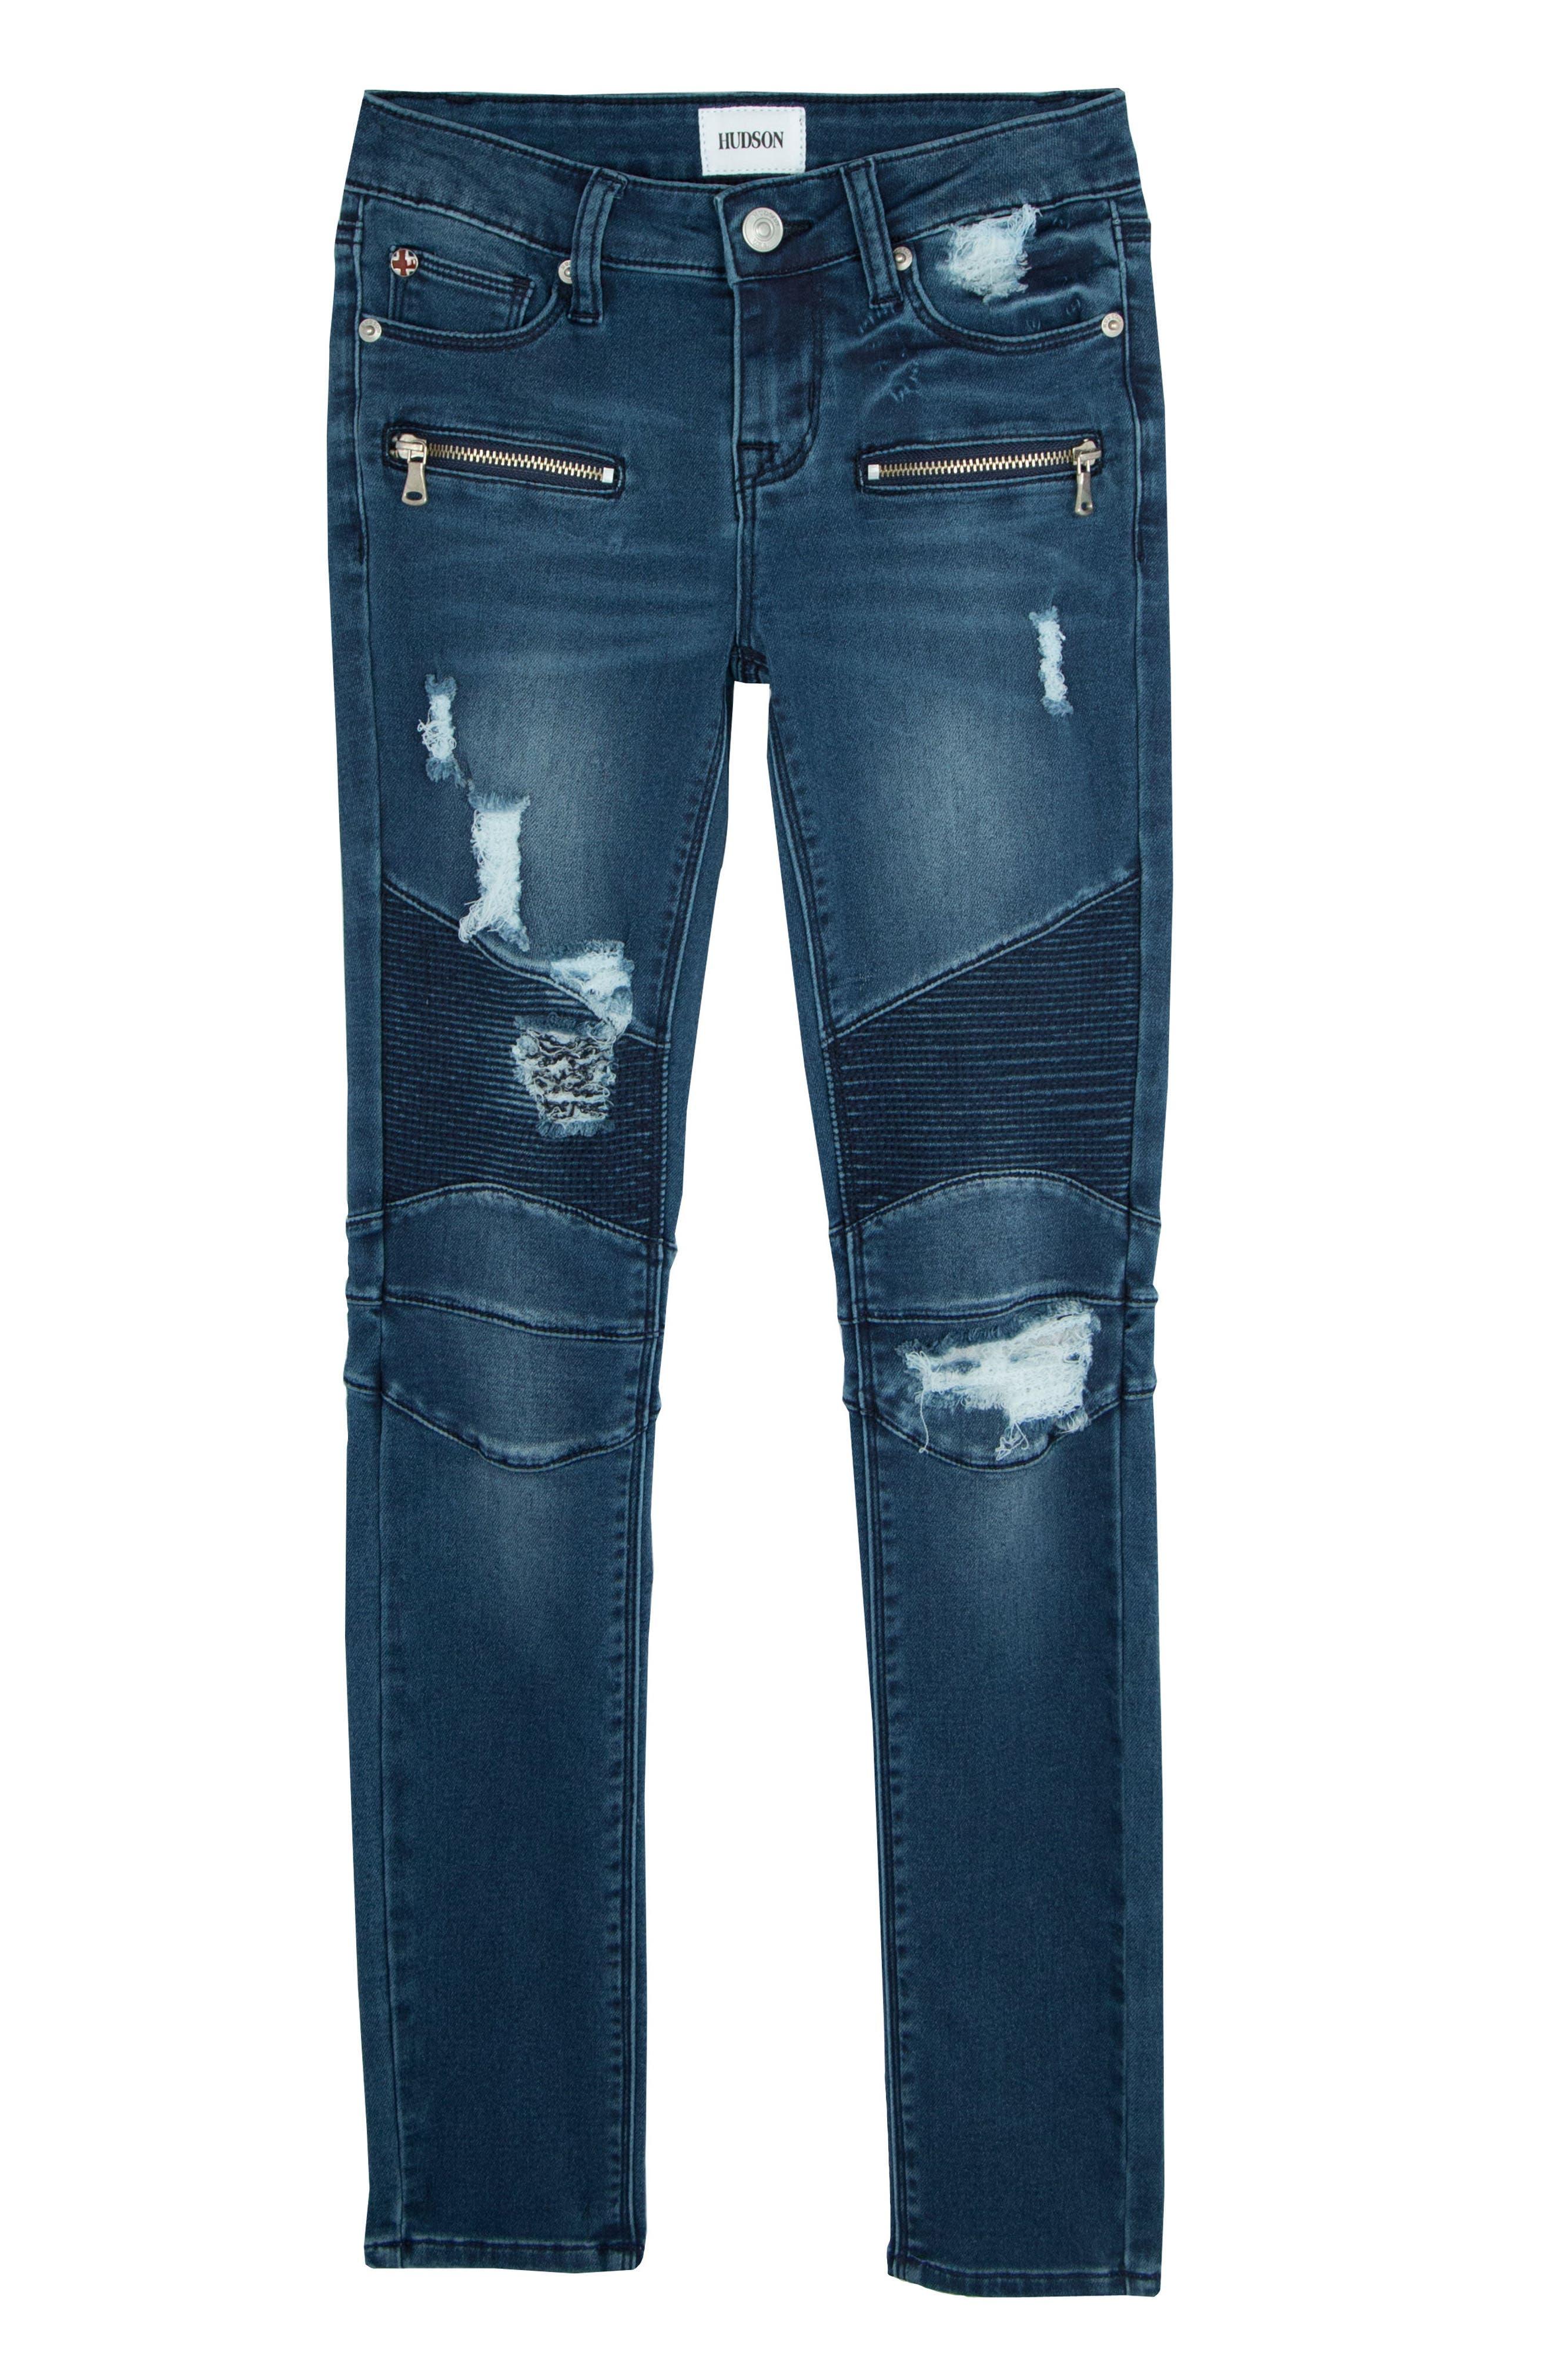 London Distressed Moto Skinny Jeans,                             Main thumbnail 1, color,                             Shaken Blue